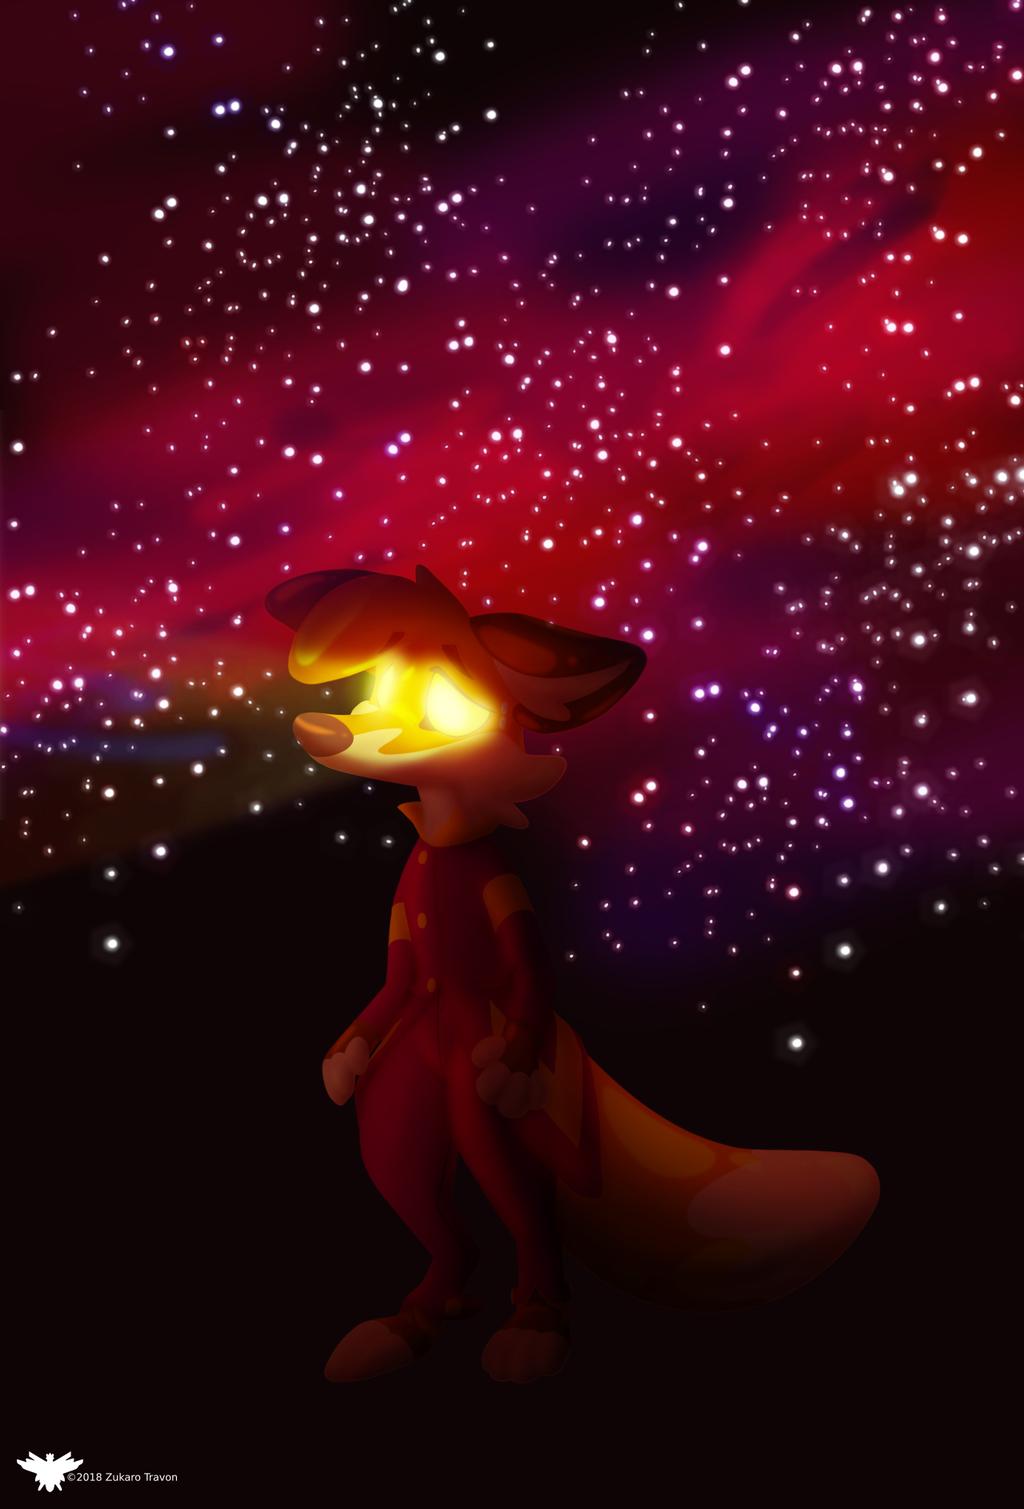 Most recent image: stars